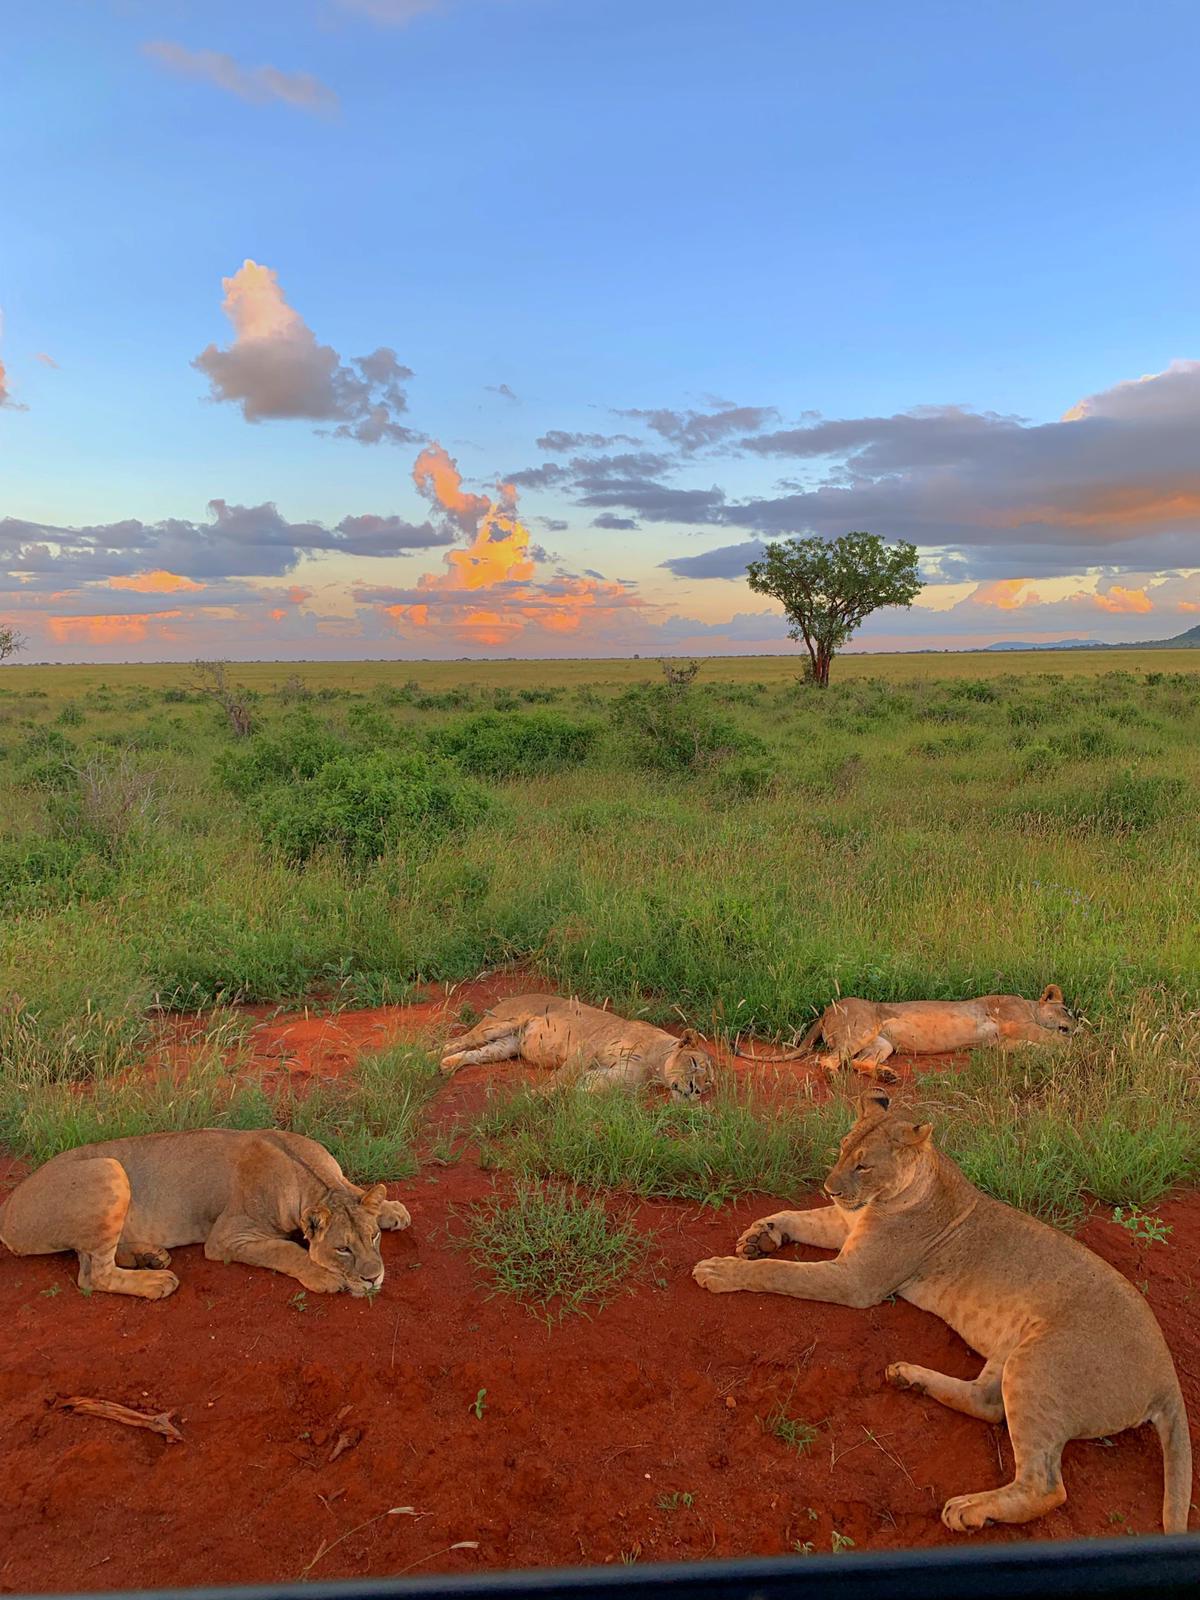 WhatsApp Image 2019 12 16 at 13.45.301 - Safari Masai Mara . Lago Nakuru . Amboseli . Taita Hills . Tsavo Est